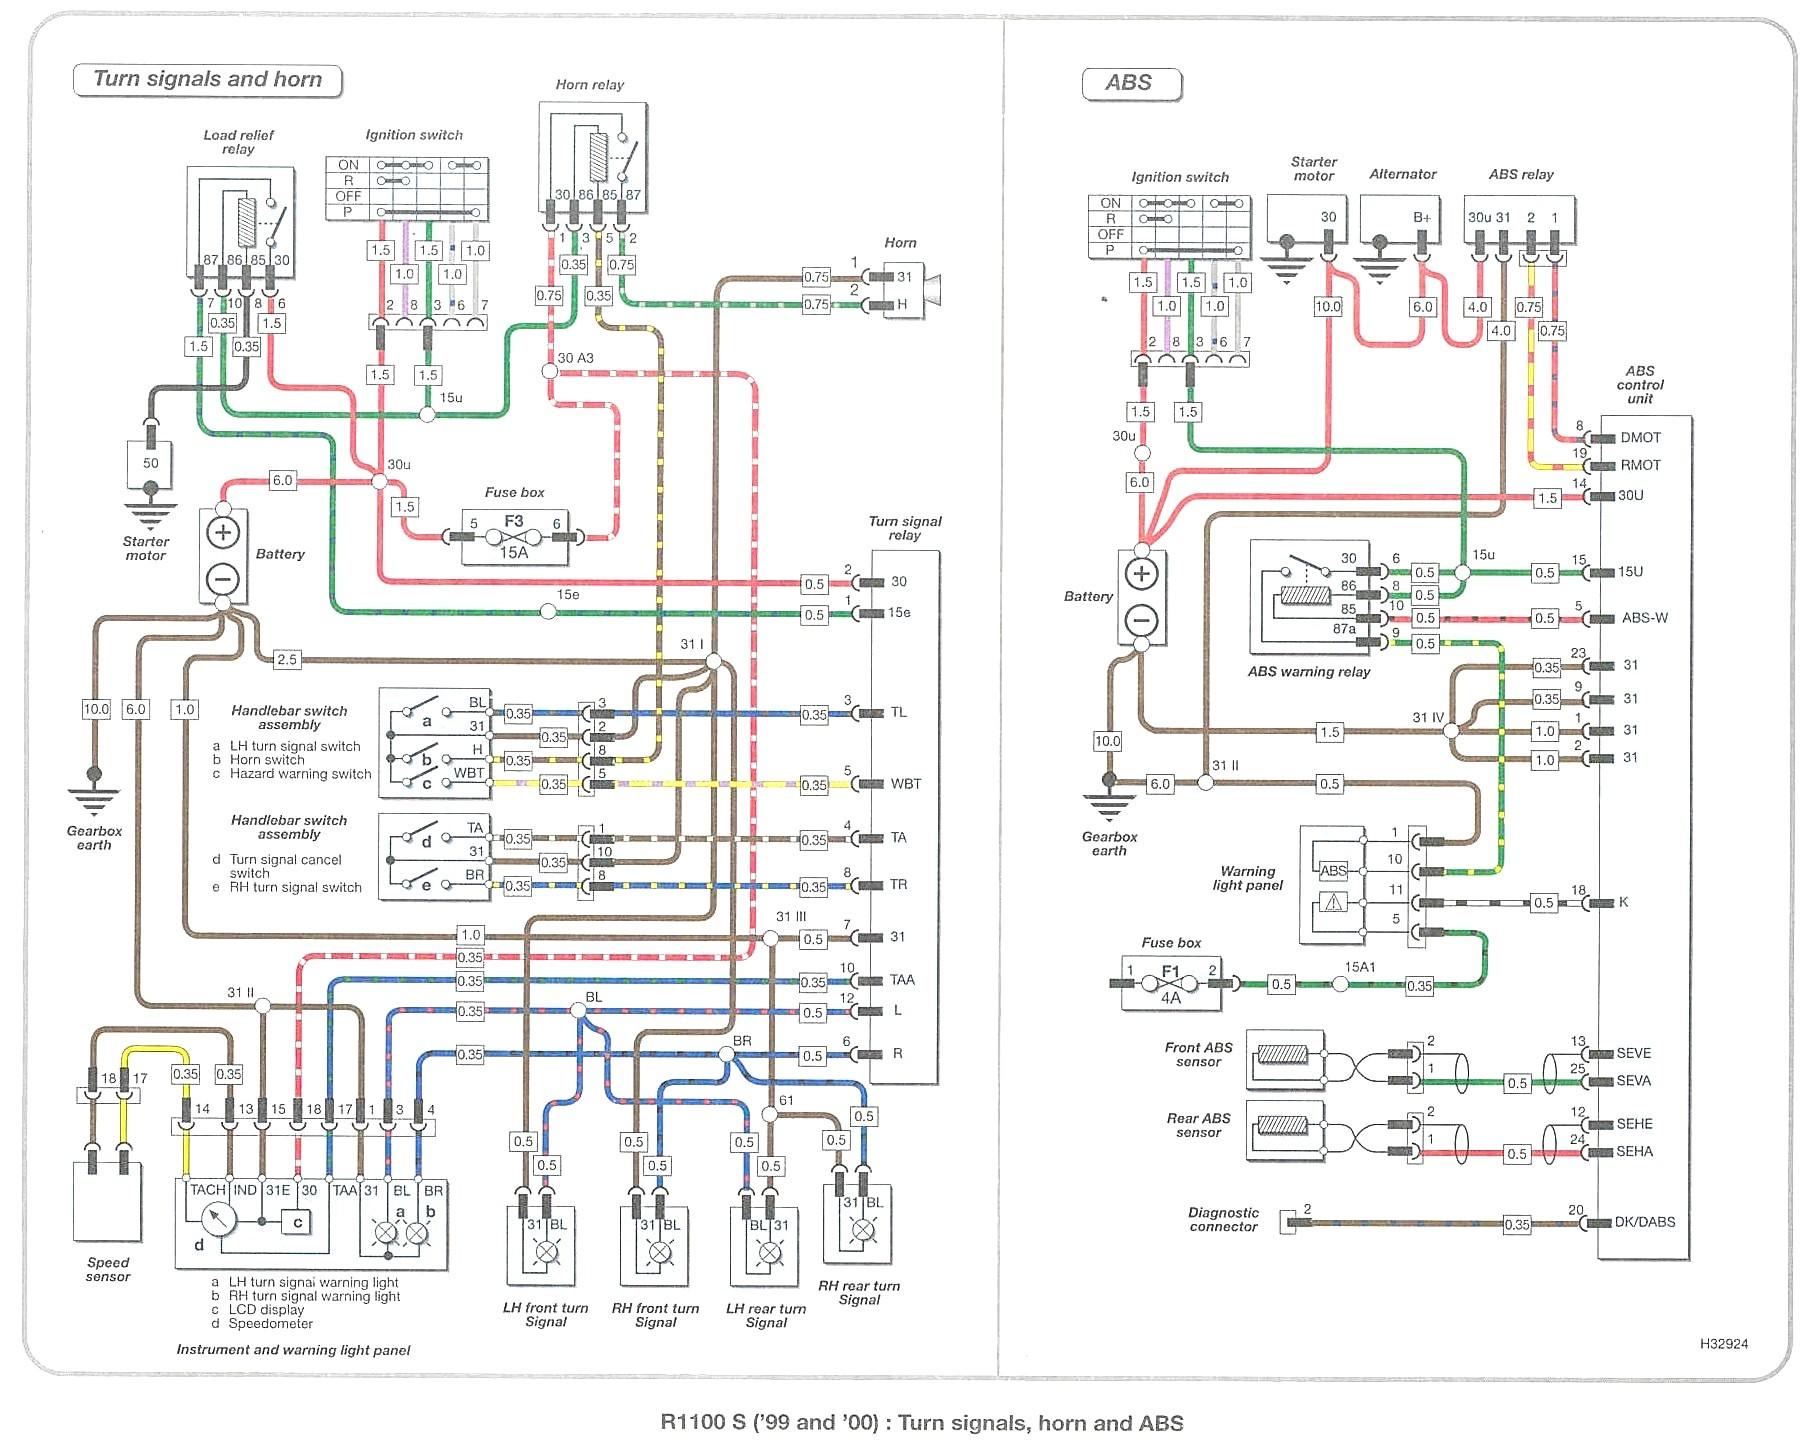 Labeled bmw e46 wiring diagram pdf e46 wiring diagram map pdf e46 wiring diagram pdf